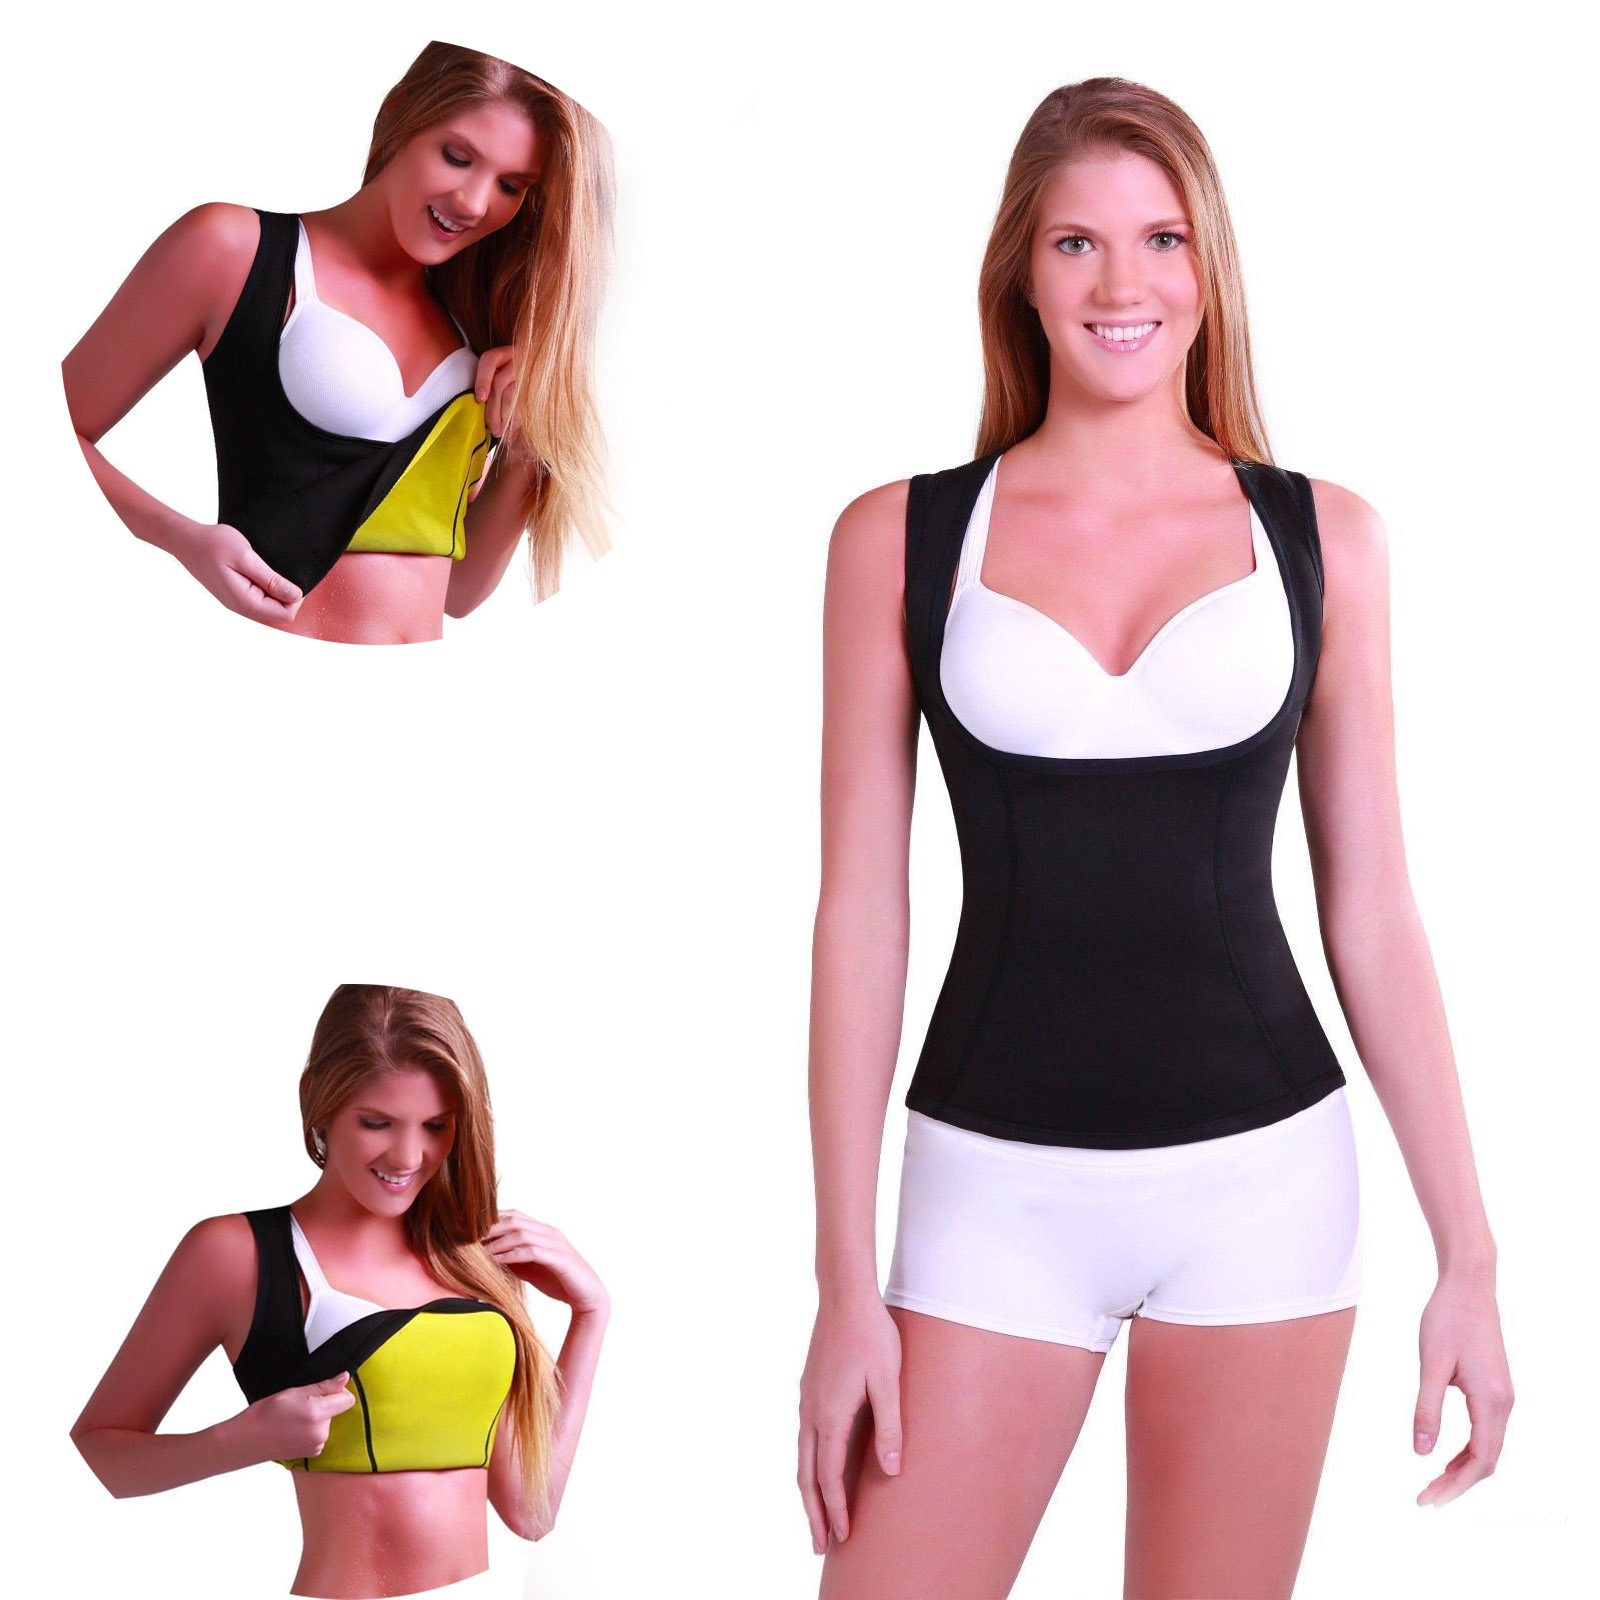 1PC Size S-XL Woman Lady Redu Waist Bust Shaper Shirt Neoprene Slimming Thermo Cami Cinchers